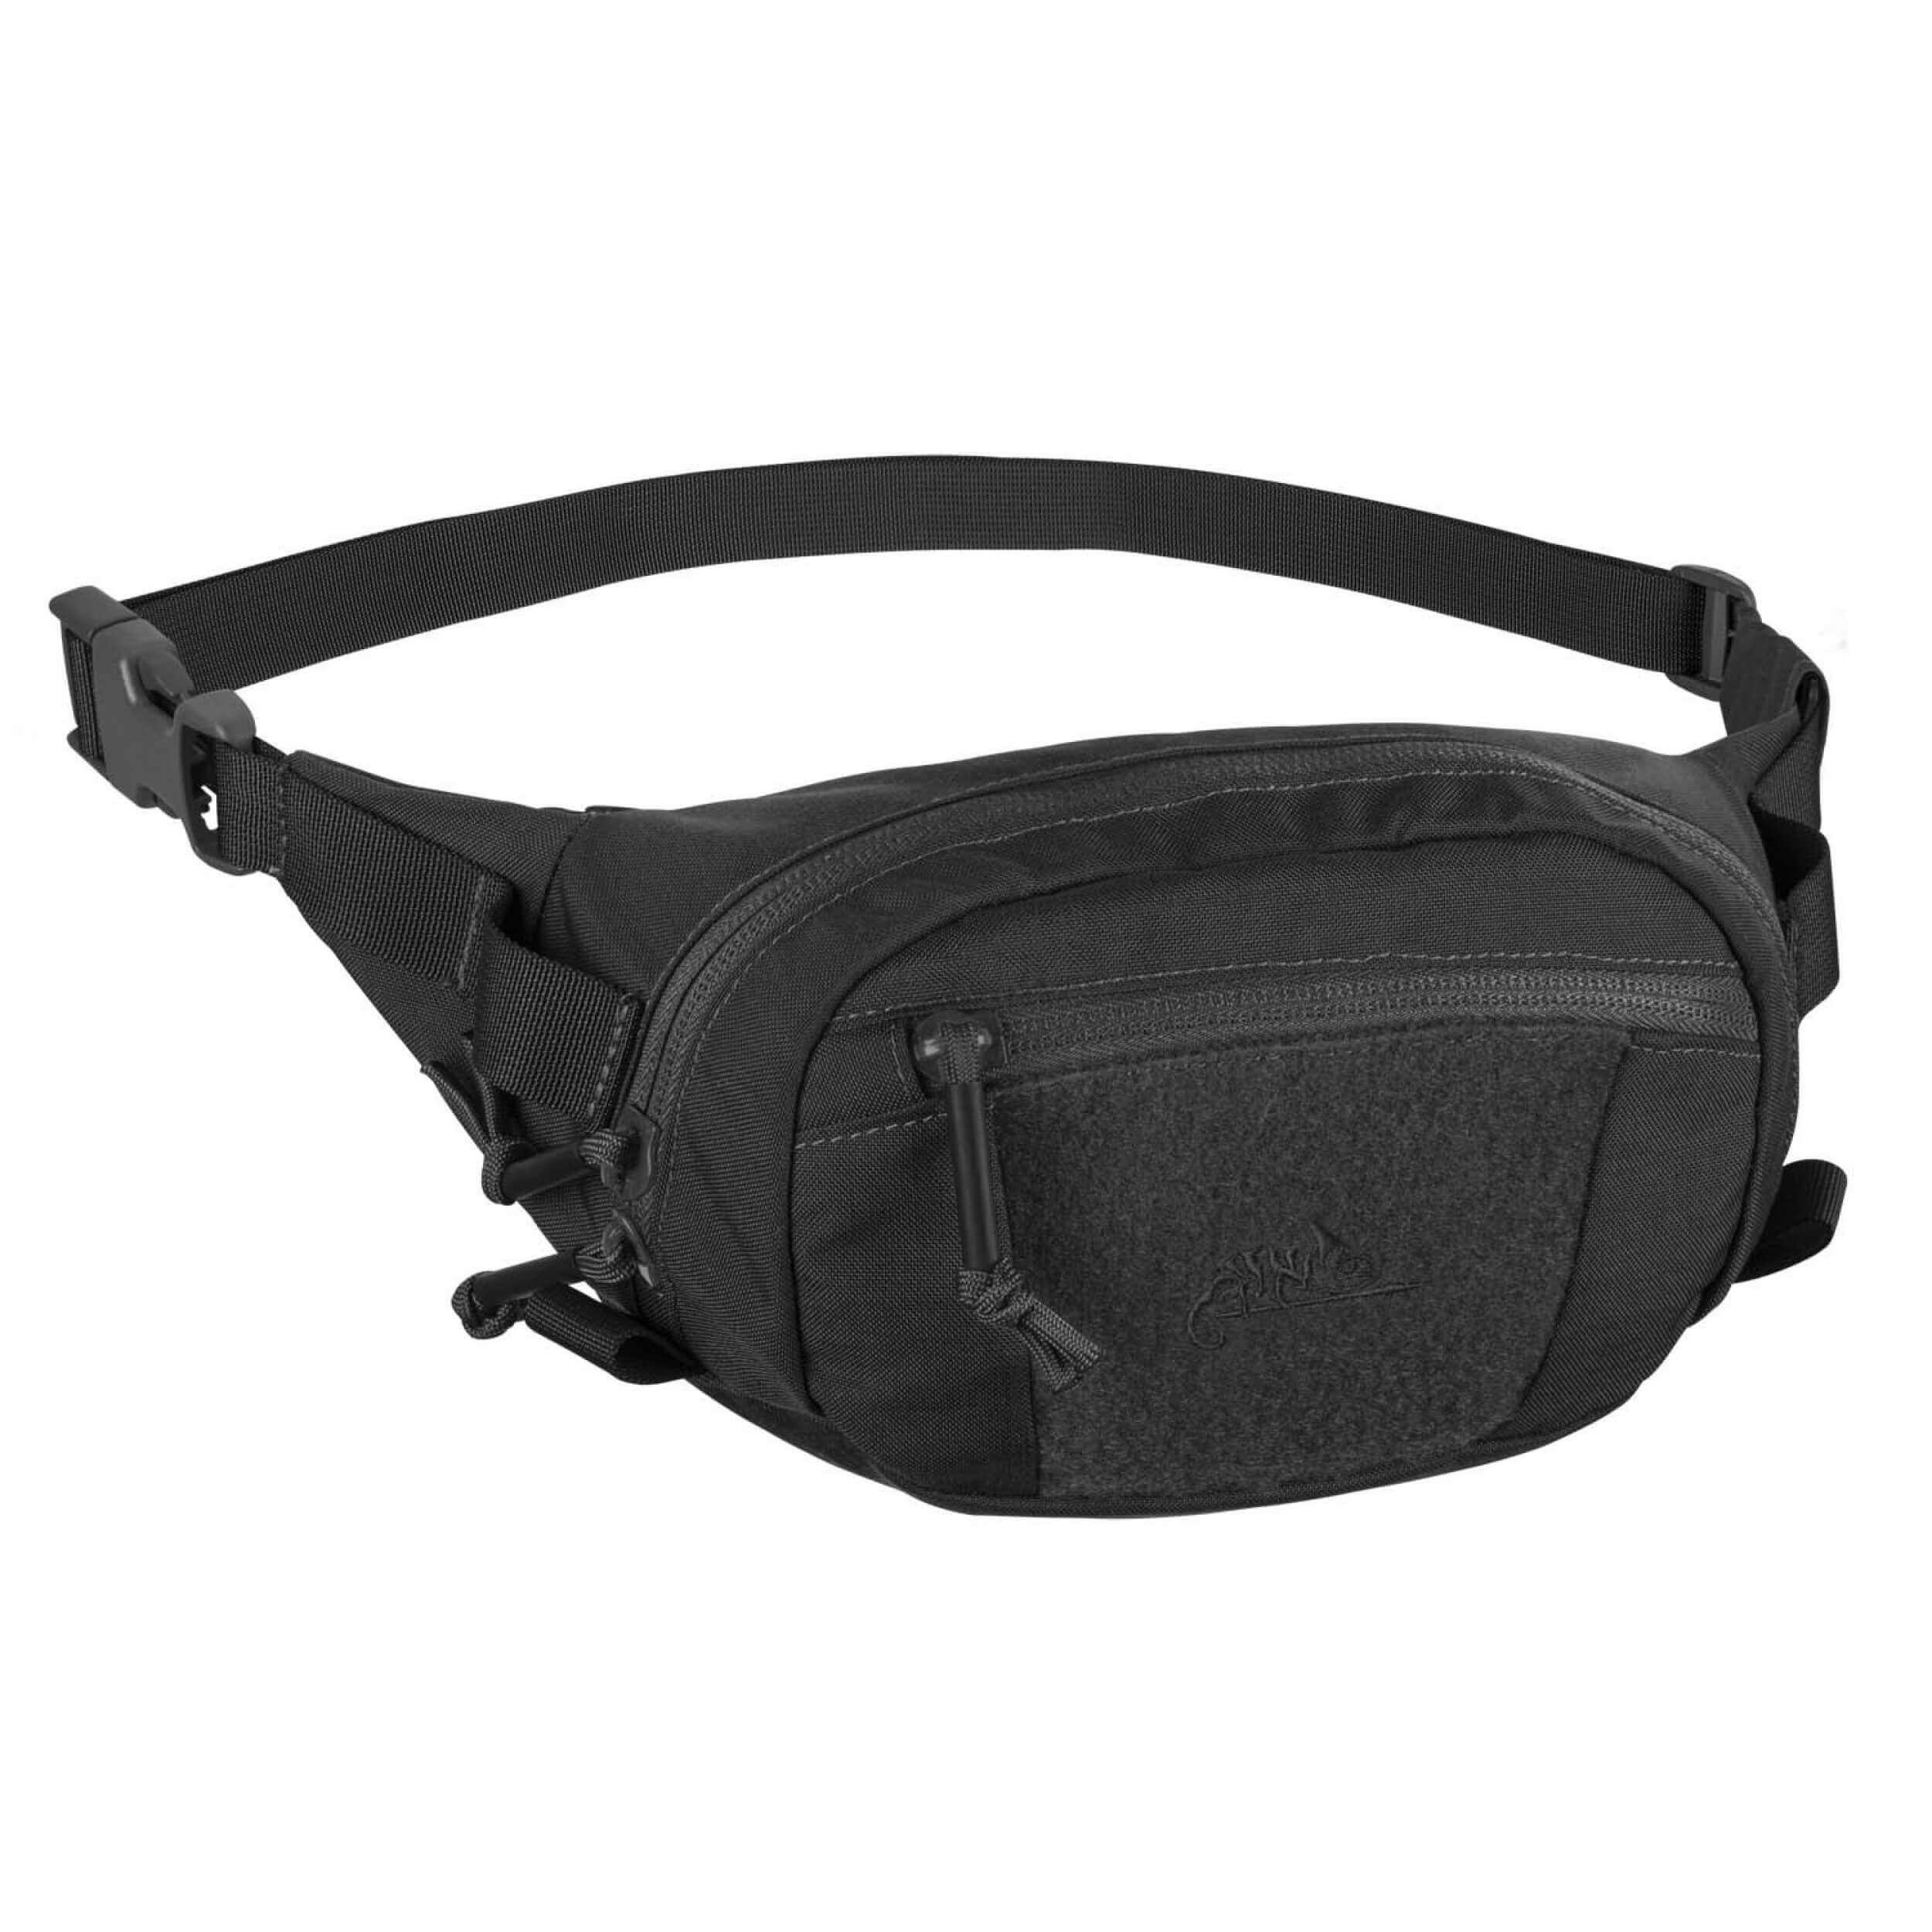 Helikon-Tex Possum Waist Pack - Cordura black